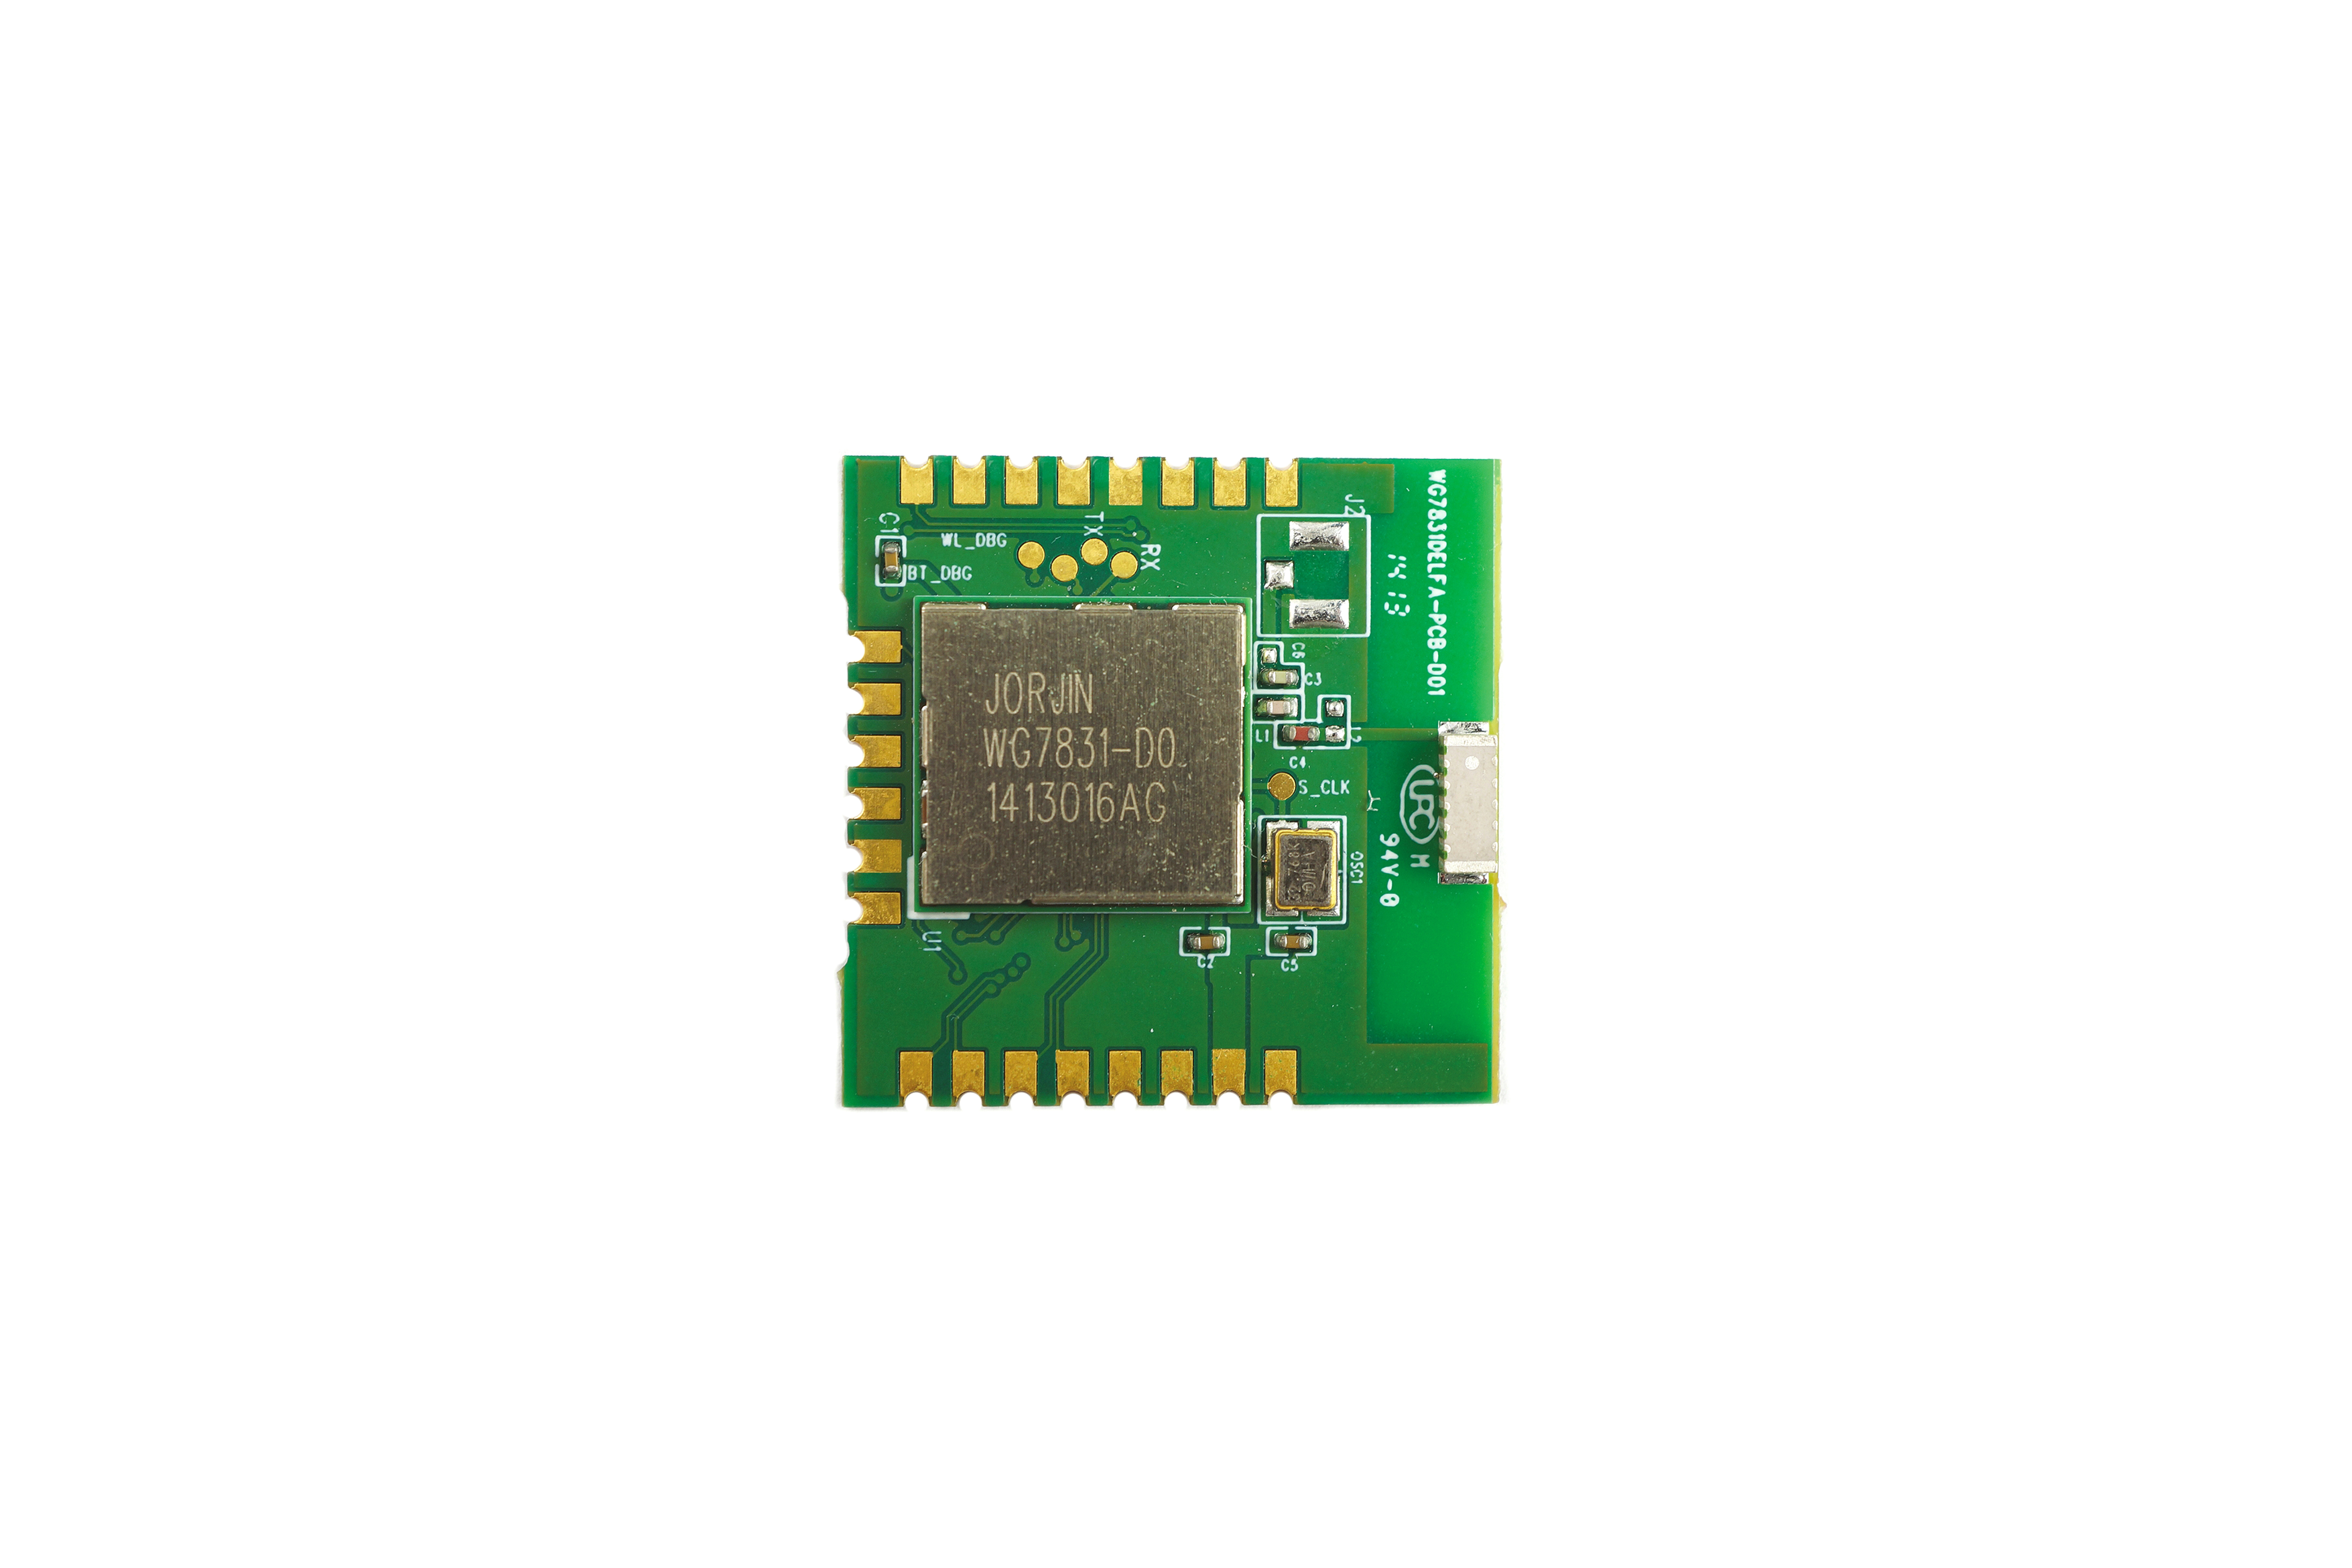 Module WLAN WG7831-DELFA, 802.11b/g/n